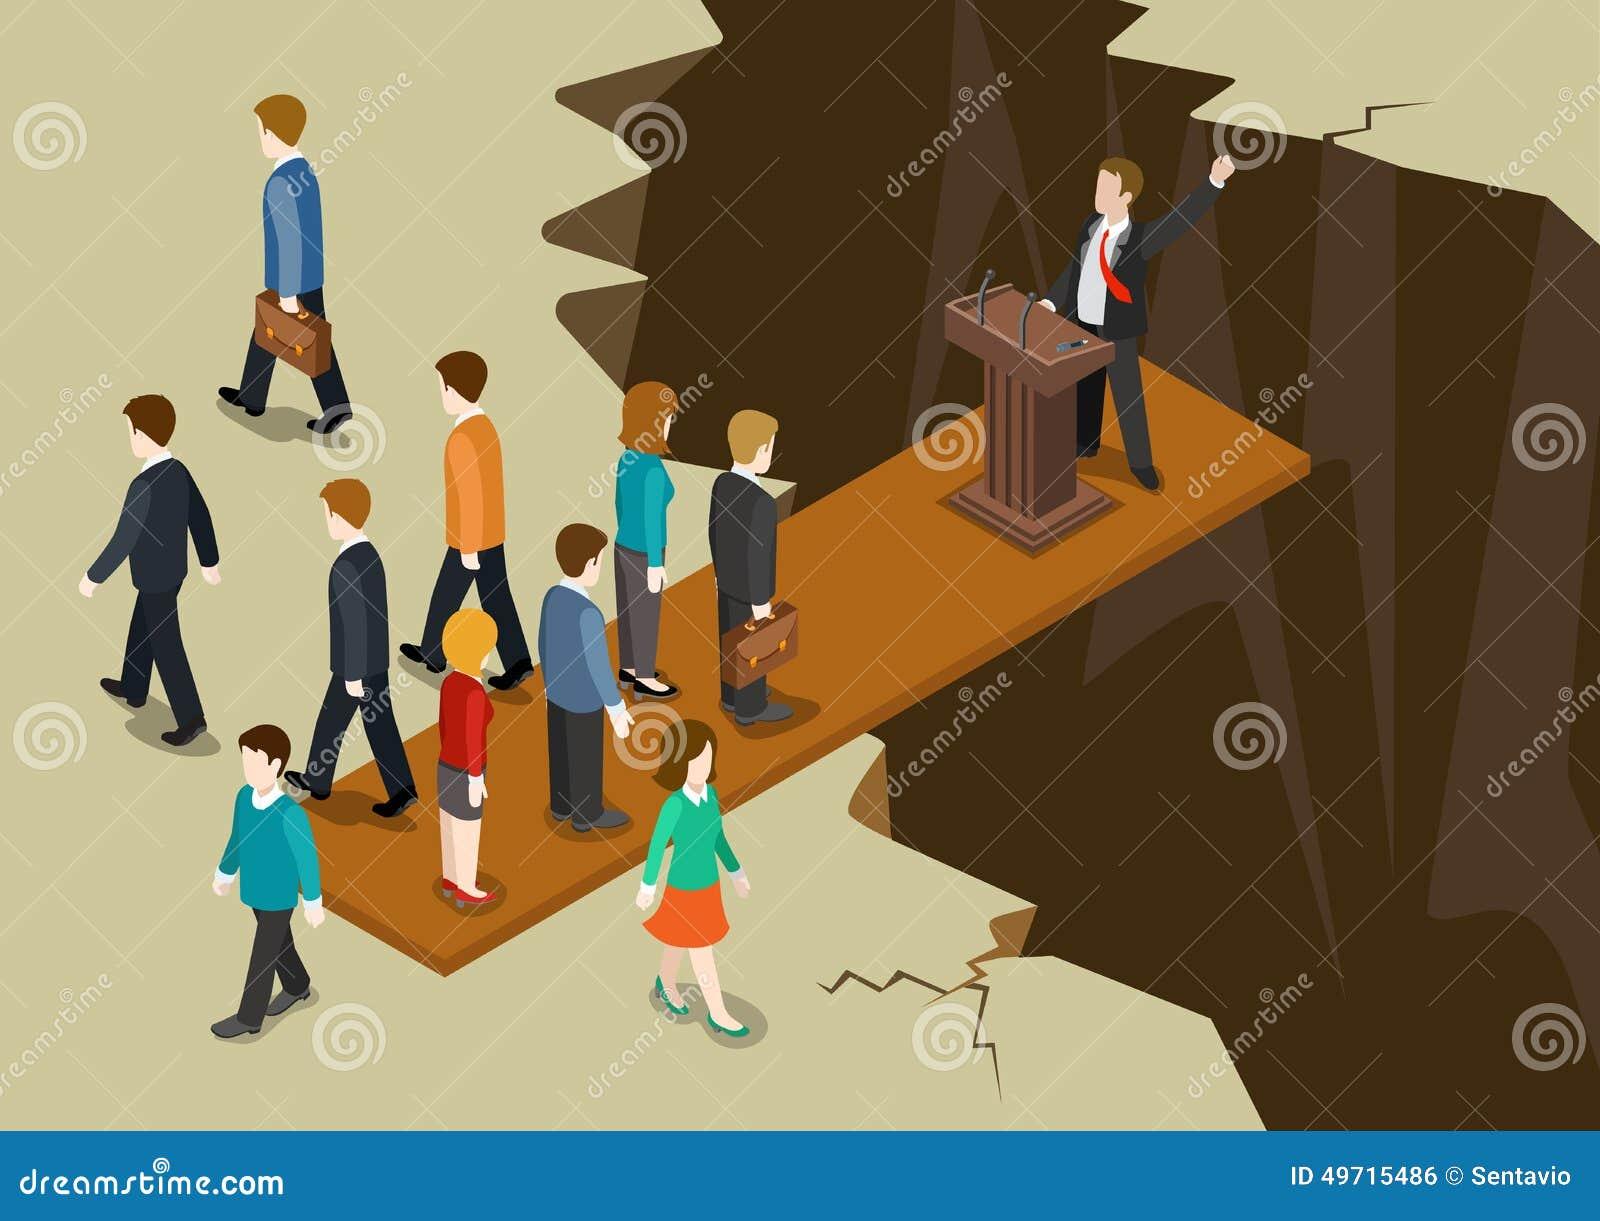 Democracy politics system imbalance collaple concept flat 3d web isometric